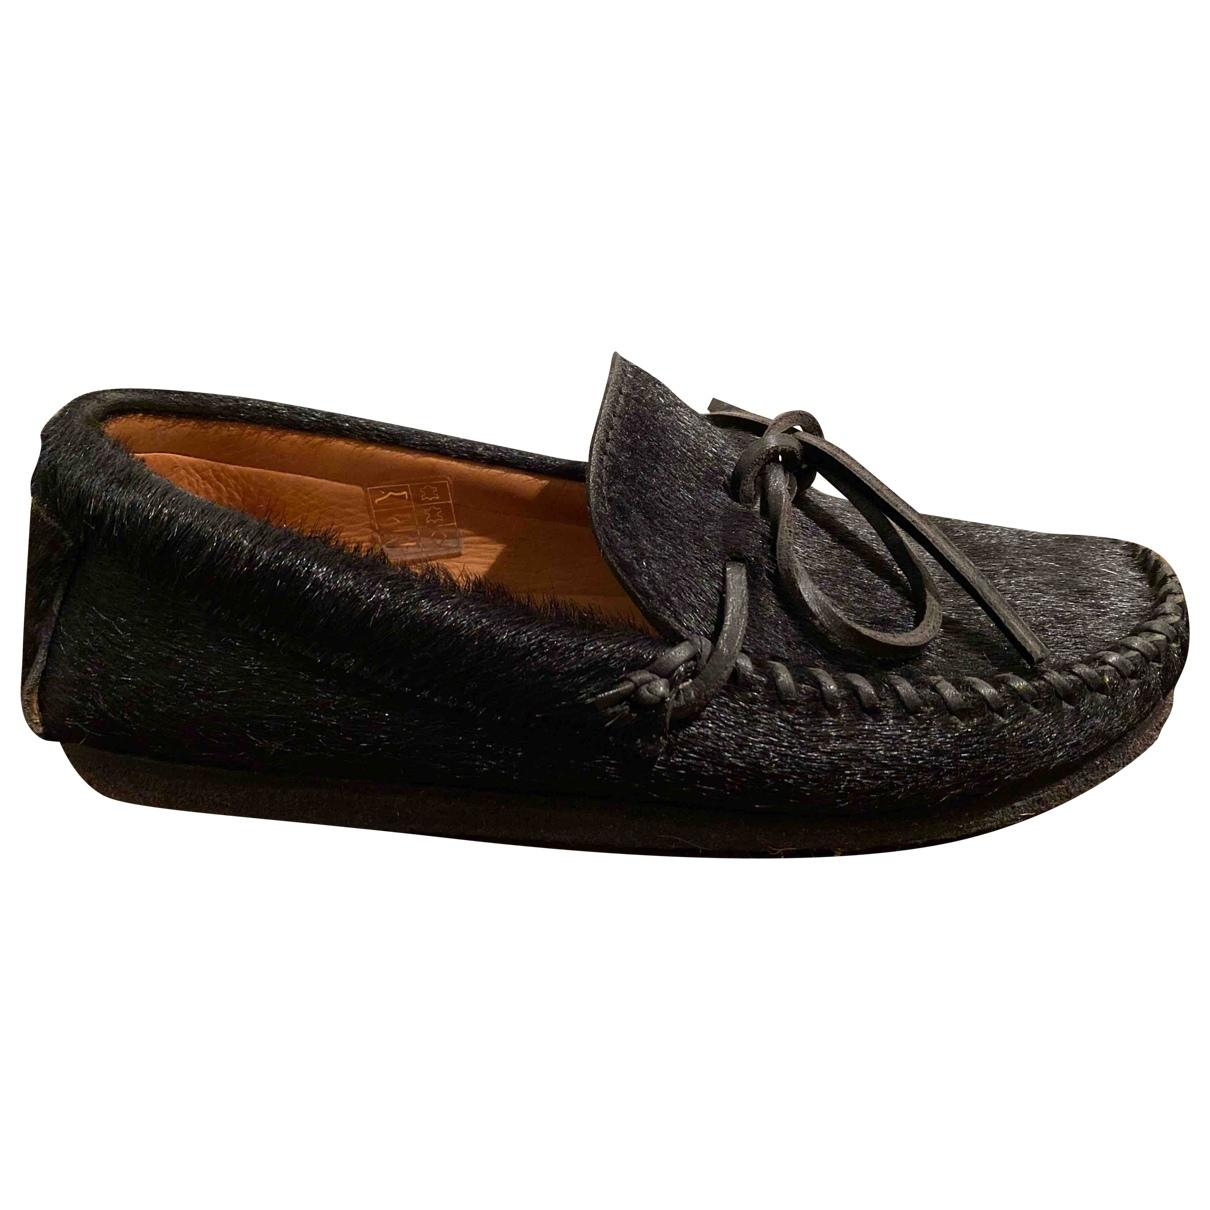 Isabel Marant \N Black Pony-style calfskin Flats for Women 36 EU